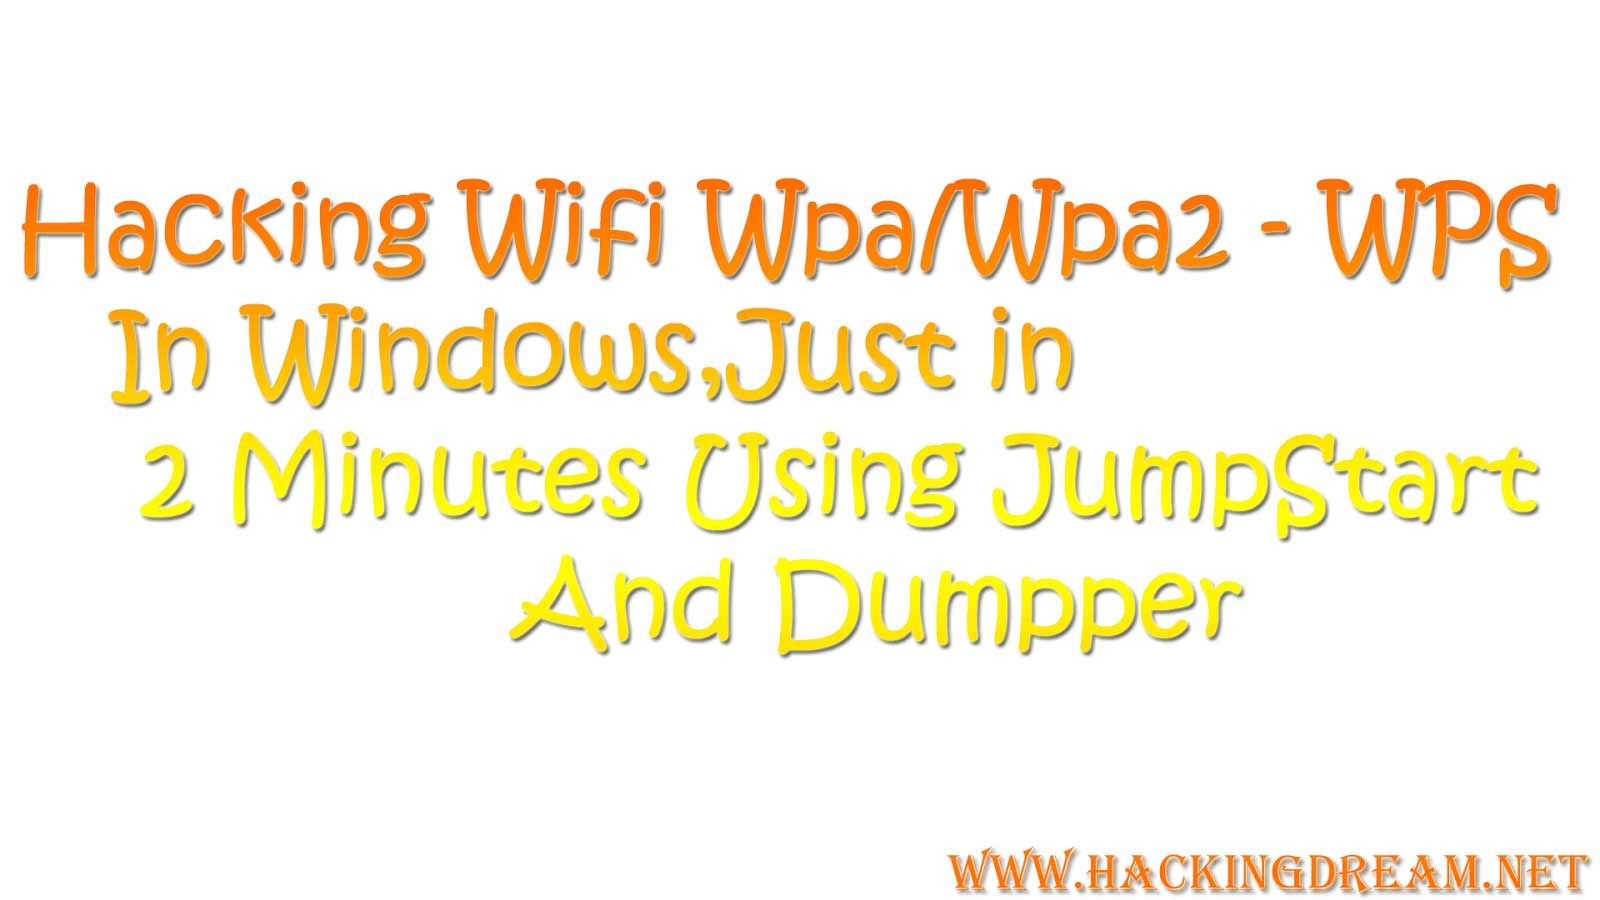 Hack Wifi Wpa/WPA2 -WPS through windows easily just in 2 minutes